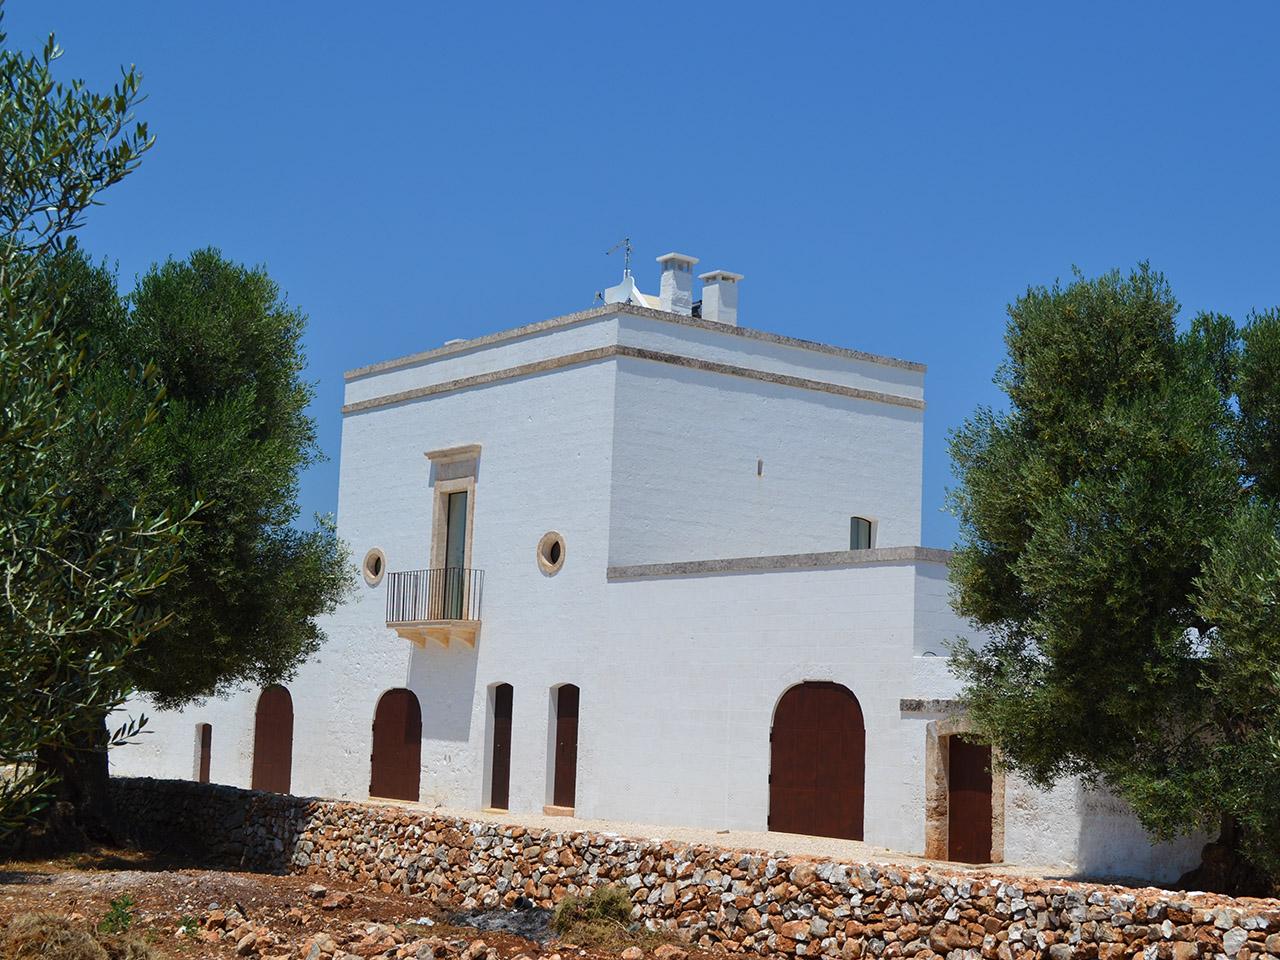 costruzioni restauri sirio ostuni restauro ristrutturazione masseria olive nardo ostuni dsc 5156